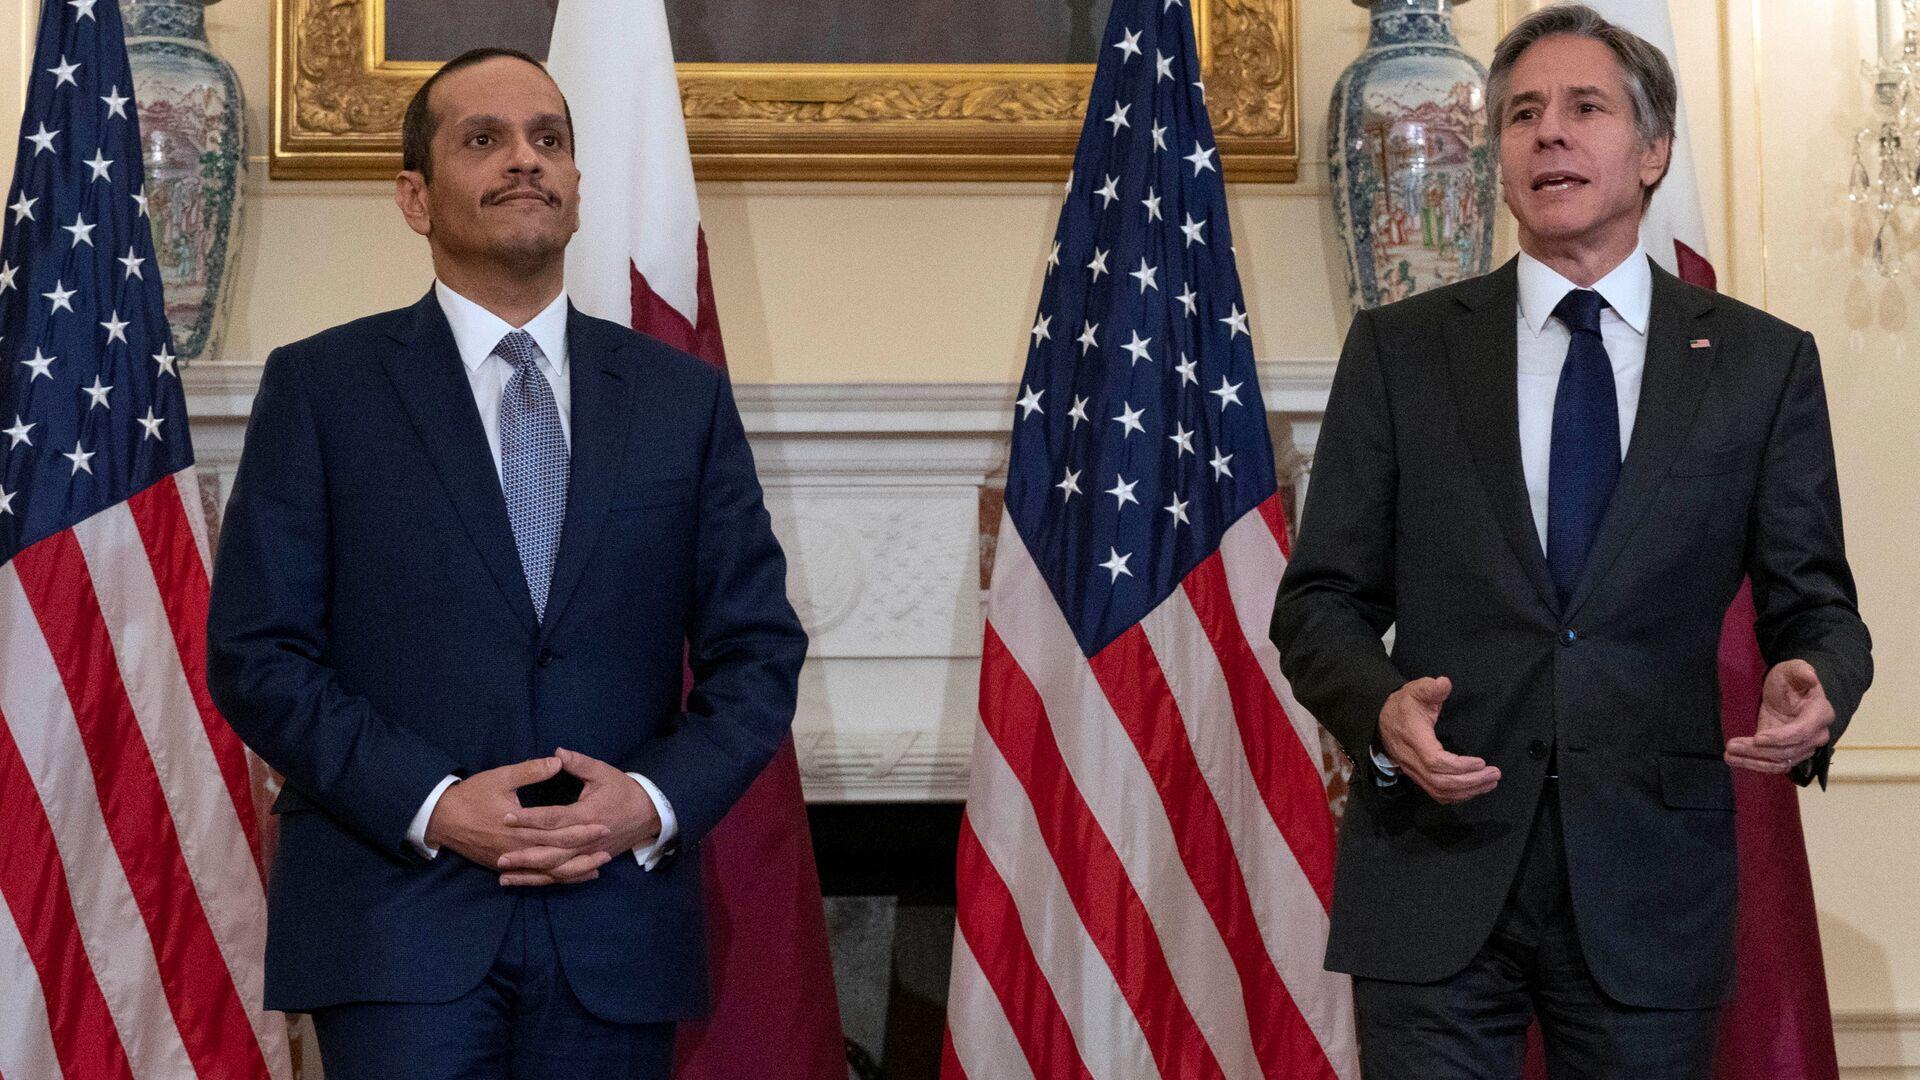 U.S. Secretary of State Antony Blinkin speaks next to  Qatar's Foreign Minister Mohammed bin Abdulrahman bin Jassim Al Thani at Department of State in Washington, D.C., U.S., July 22, 2021. - Sputnik International, 1920, 14.09.2021